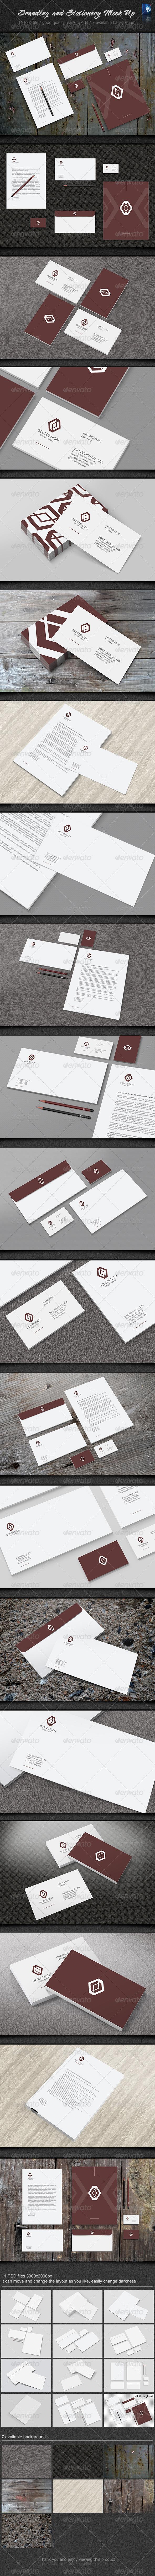 GraphicRiver Stationery Branding Mock-Up 6000978